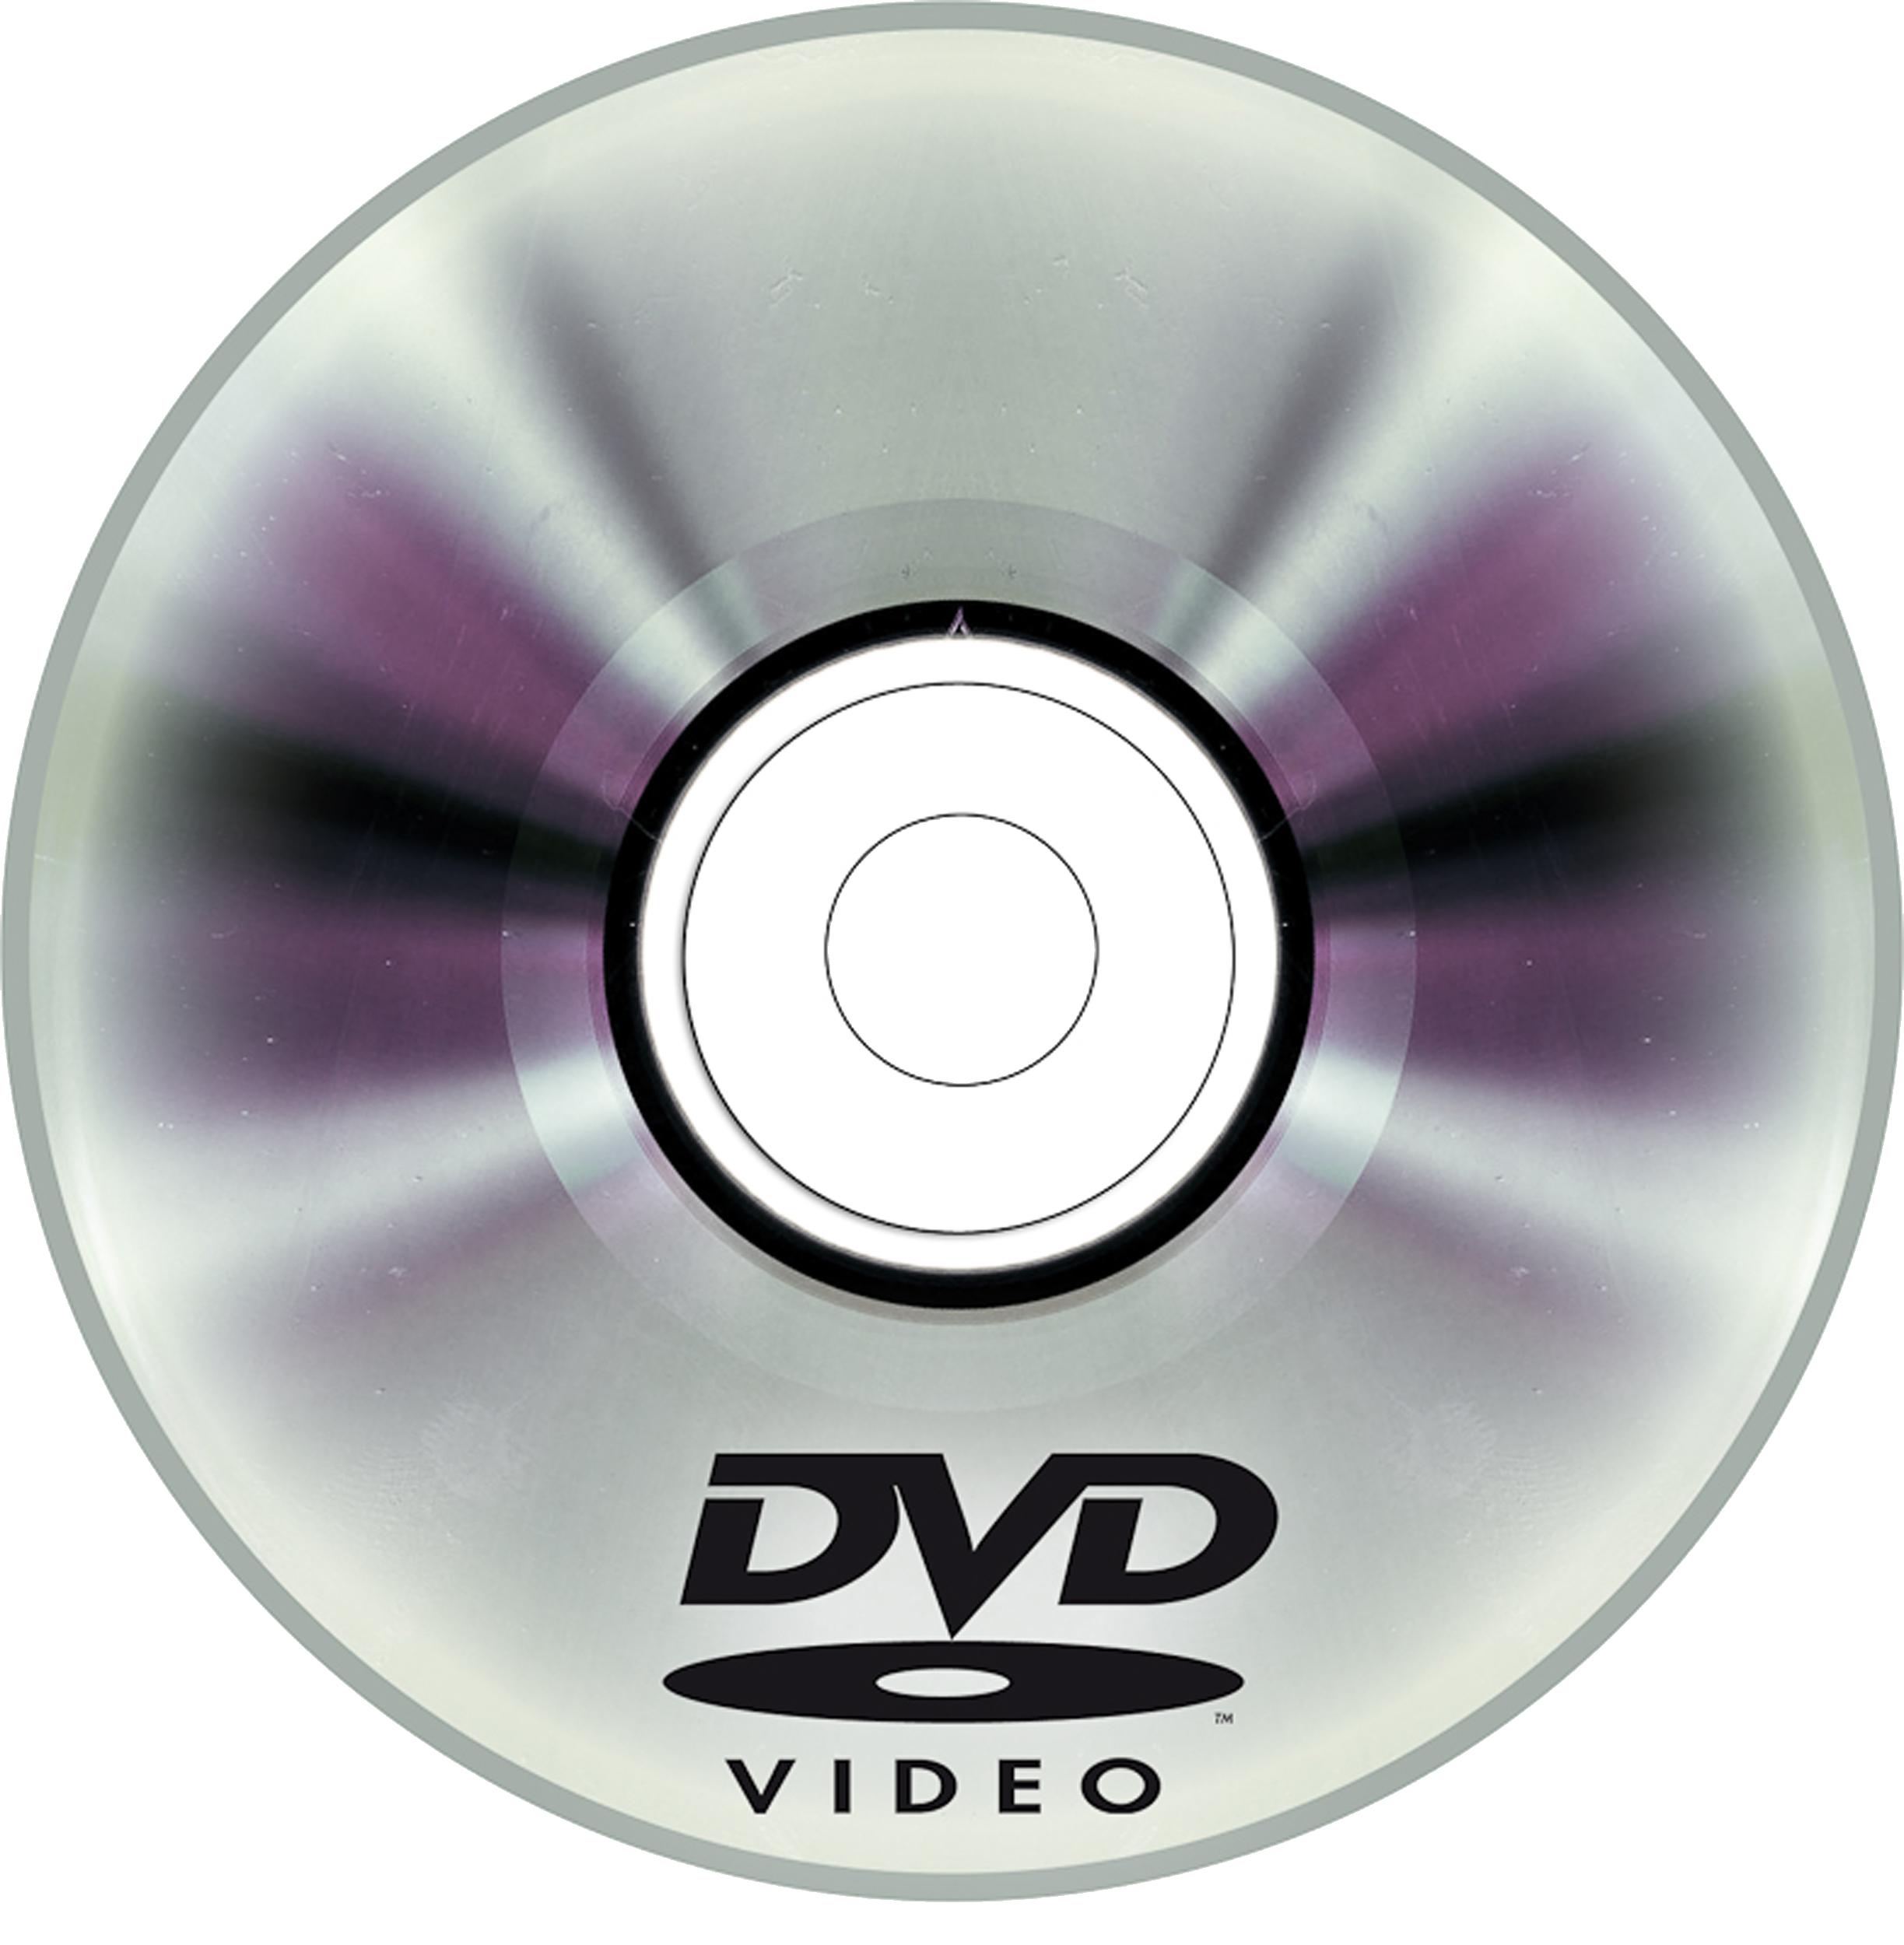 CD/DVD PNG images Download